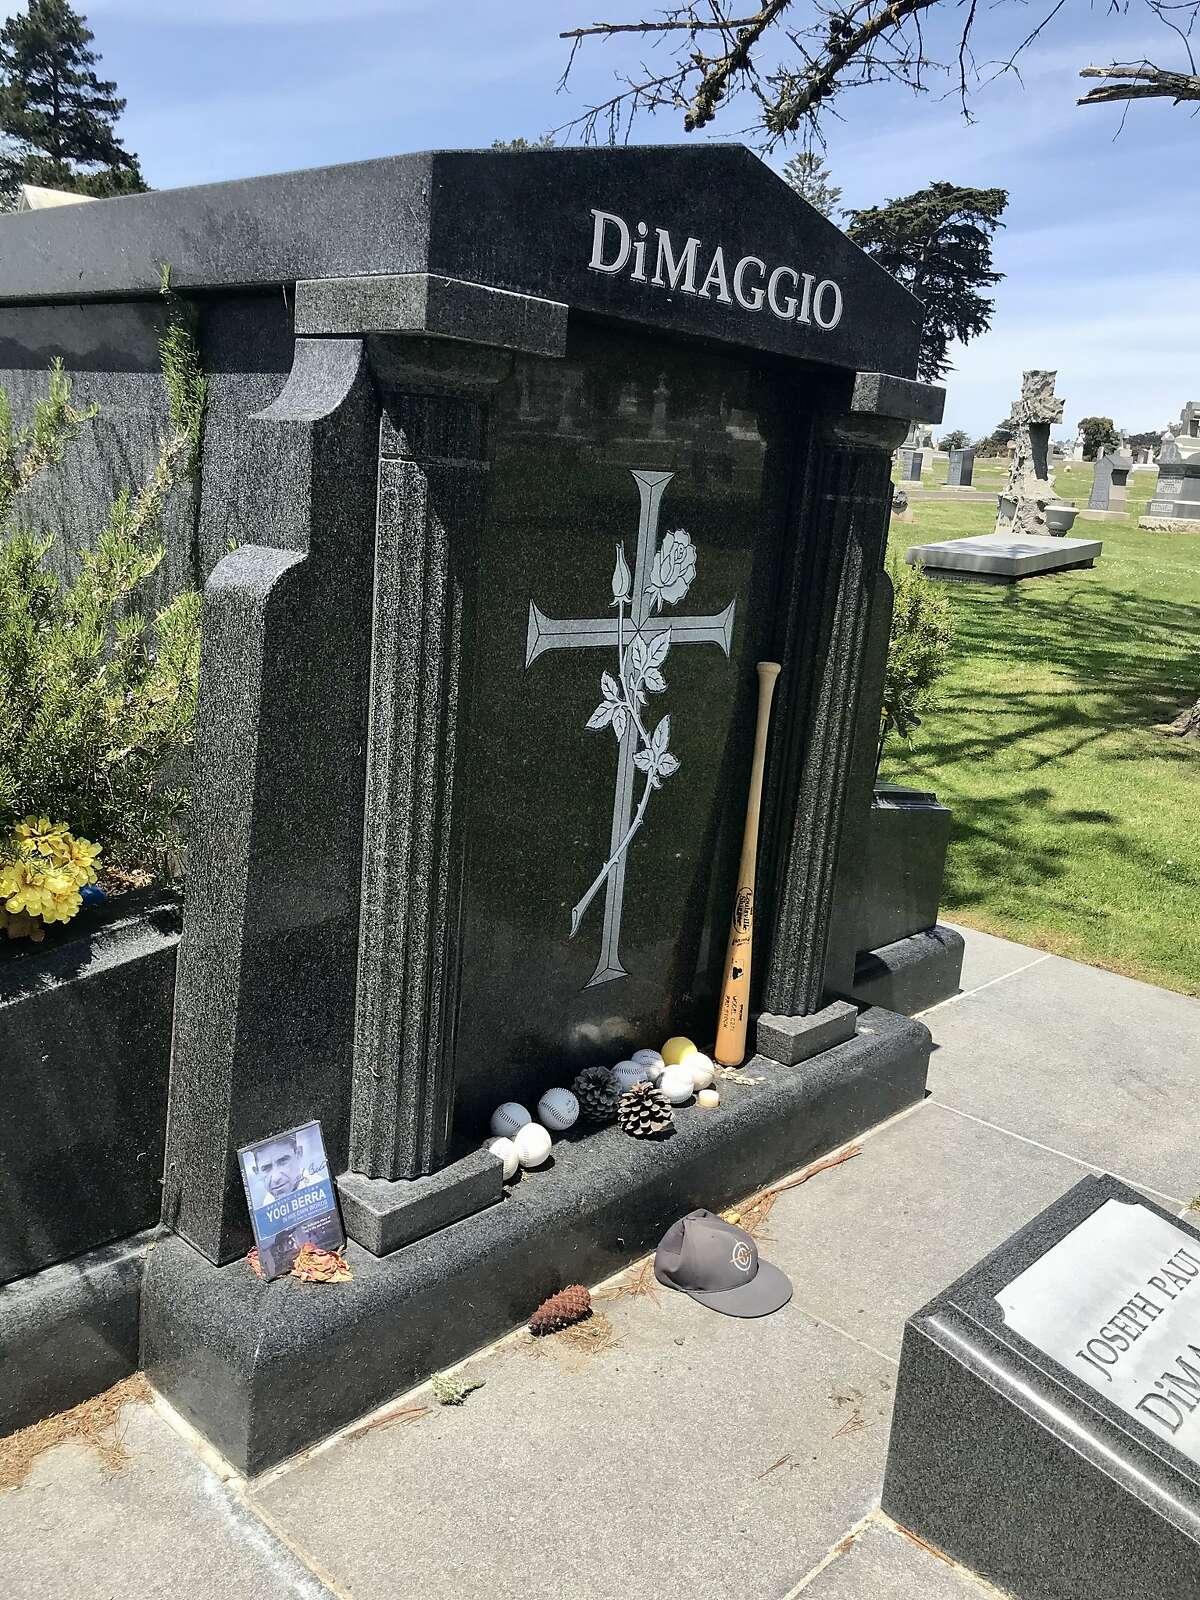 Joe Di Maggio's grave at Holy Cross Catholic cemetery, Colma. Baseball equipment is ready for action, Di Maggio less so.